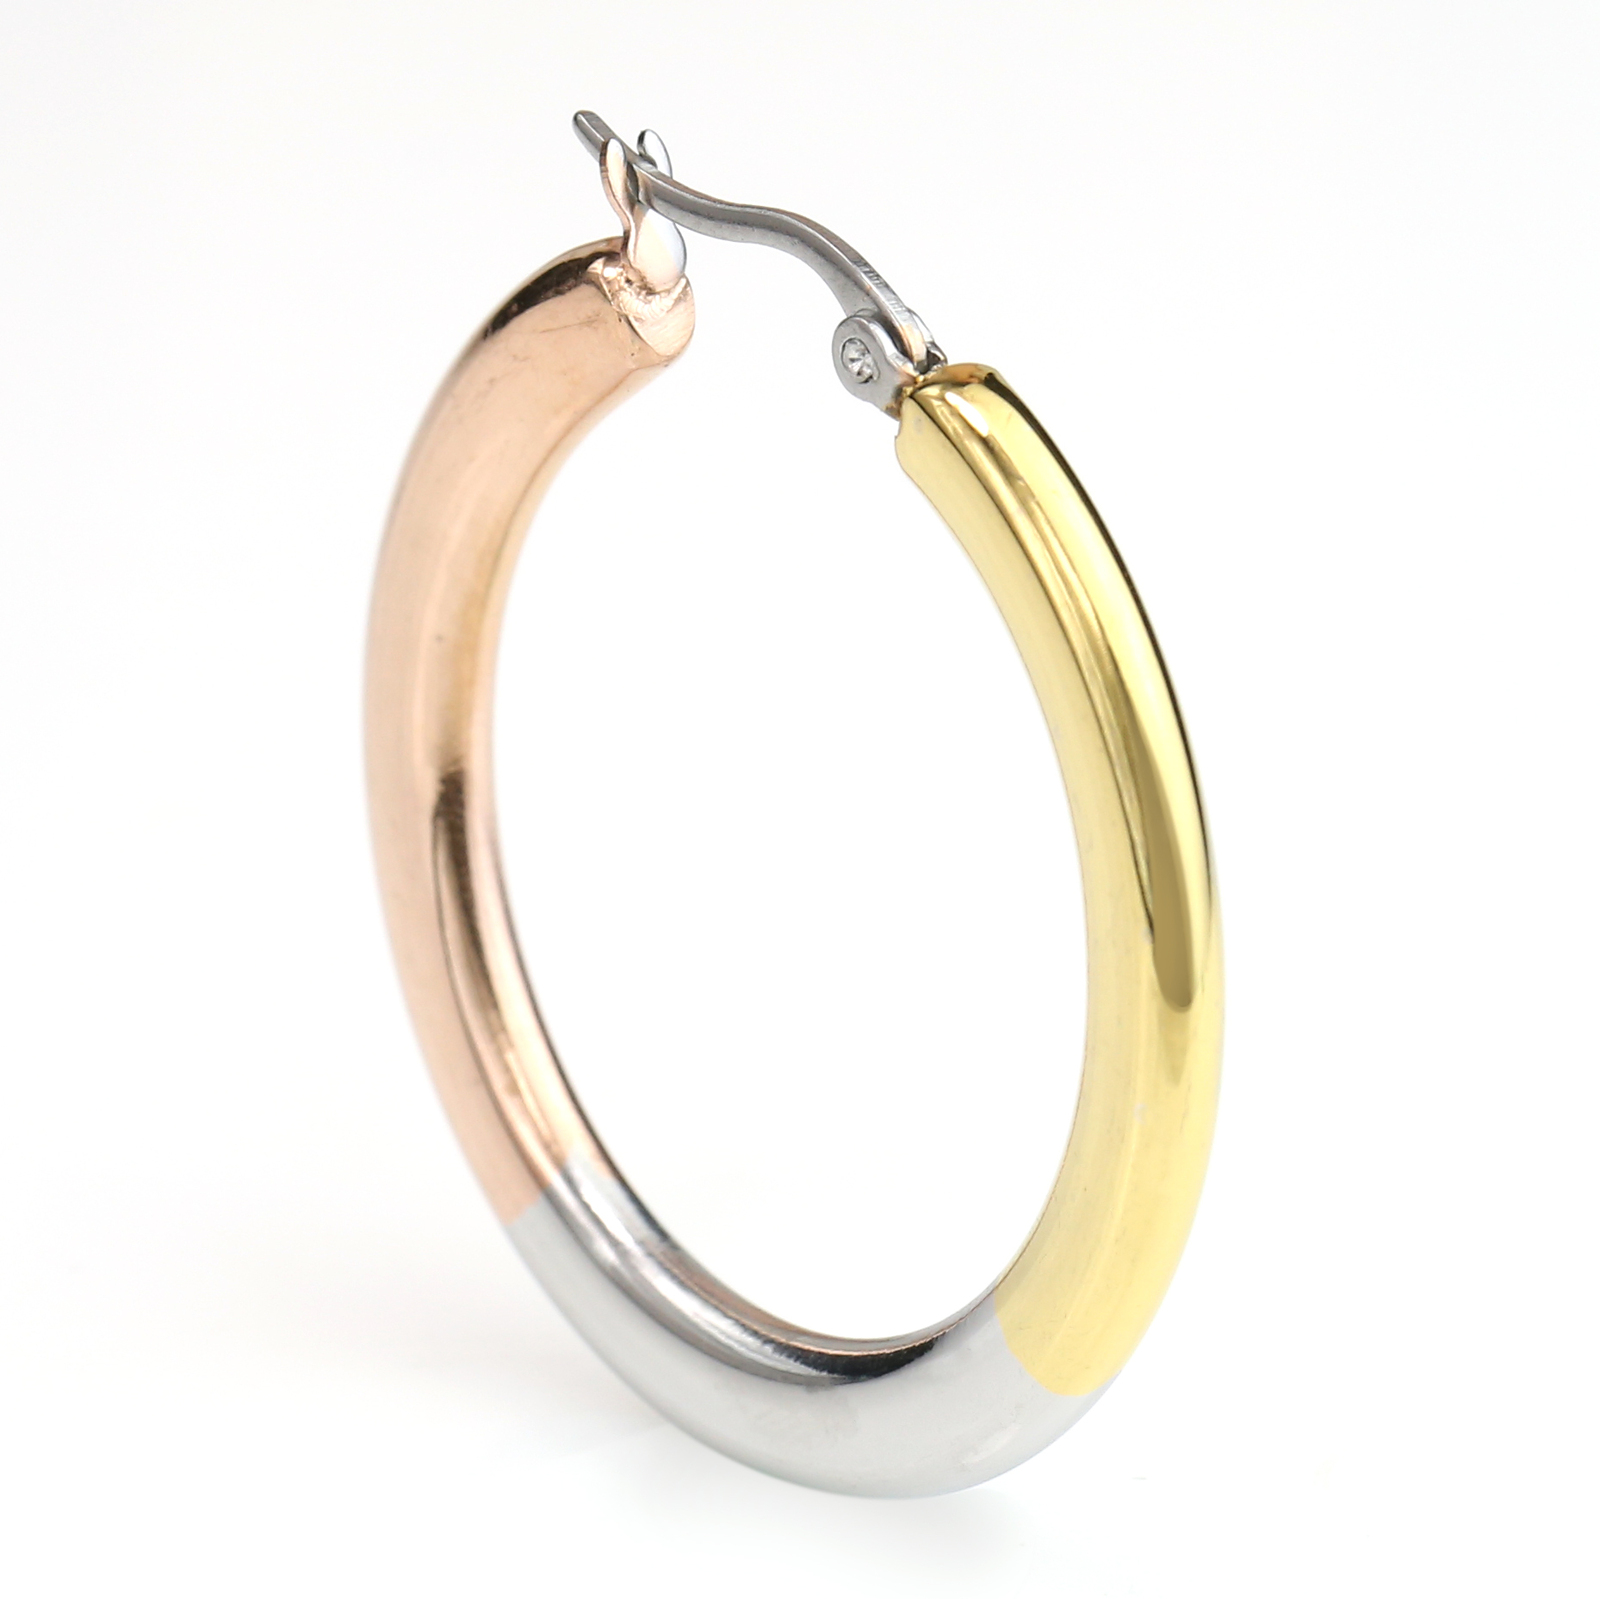 Sleek Polished Tri-Color Silver, Gold & Rose Tone Hoop Earrings- United Elegance